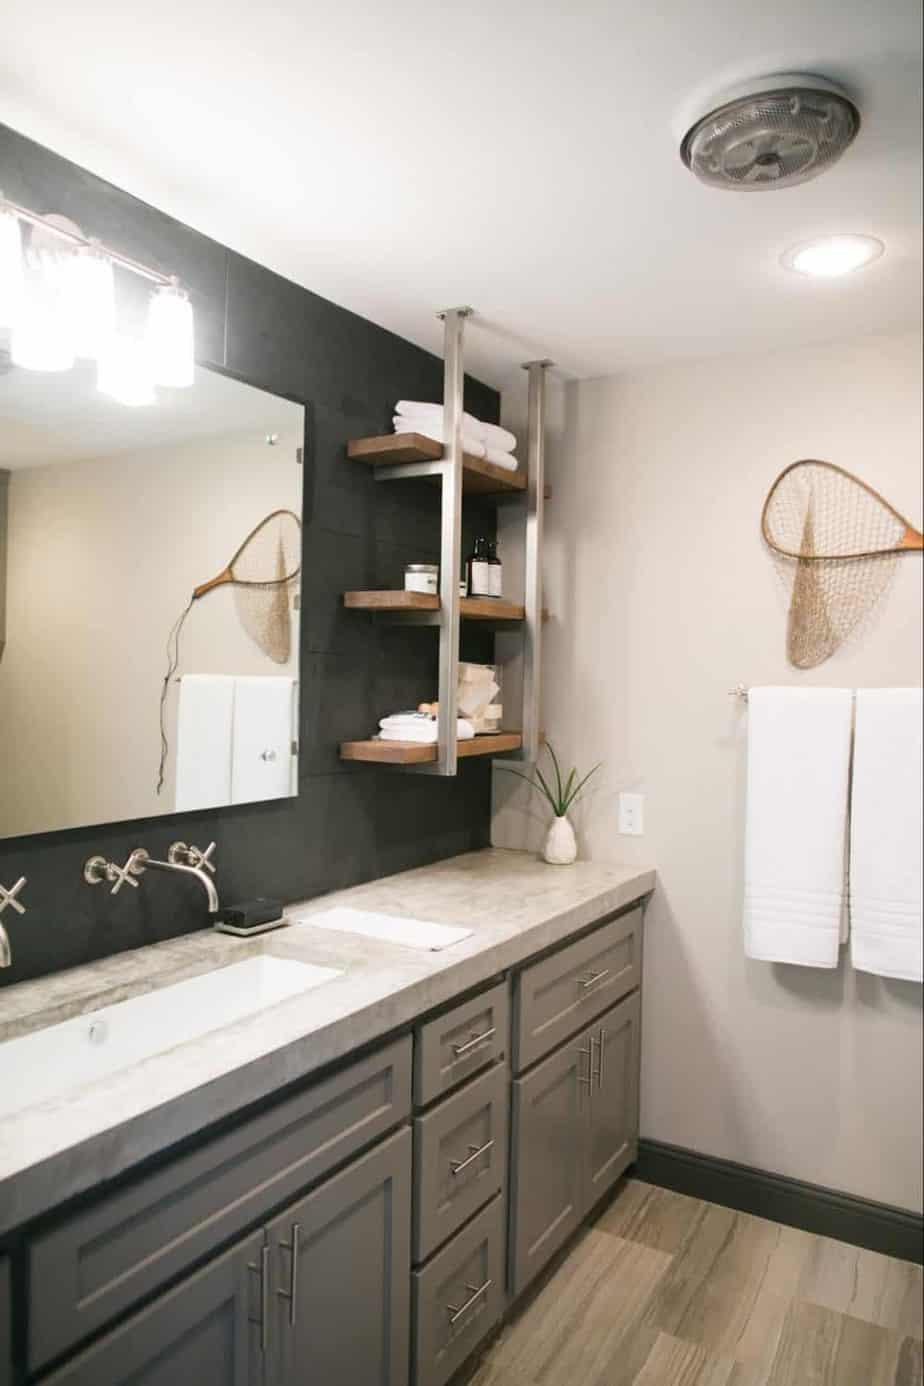 Fixer Upper bathroom with concrete countertops